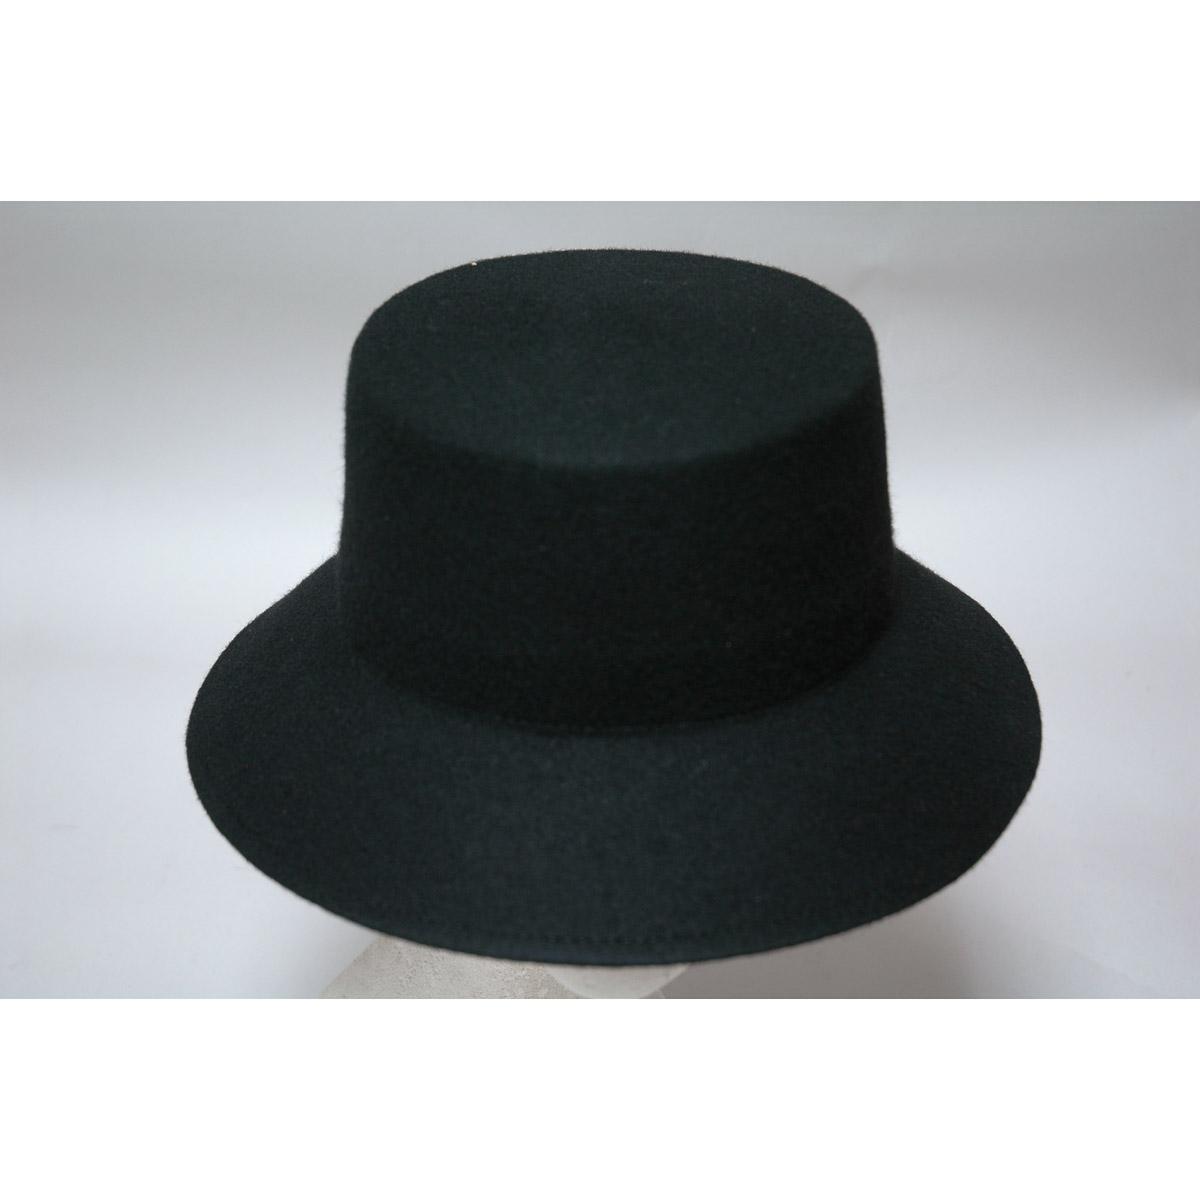 1370745b3be46 Black Lampshade Small Brim Flat Top Blocked Untrimmed Felt Hat Base